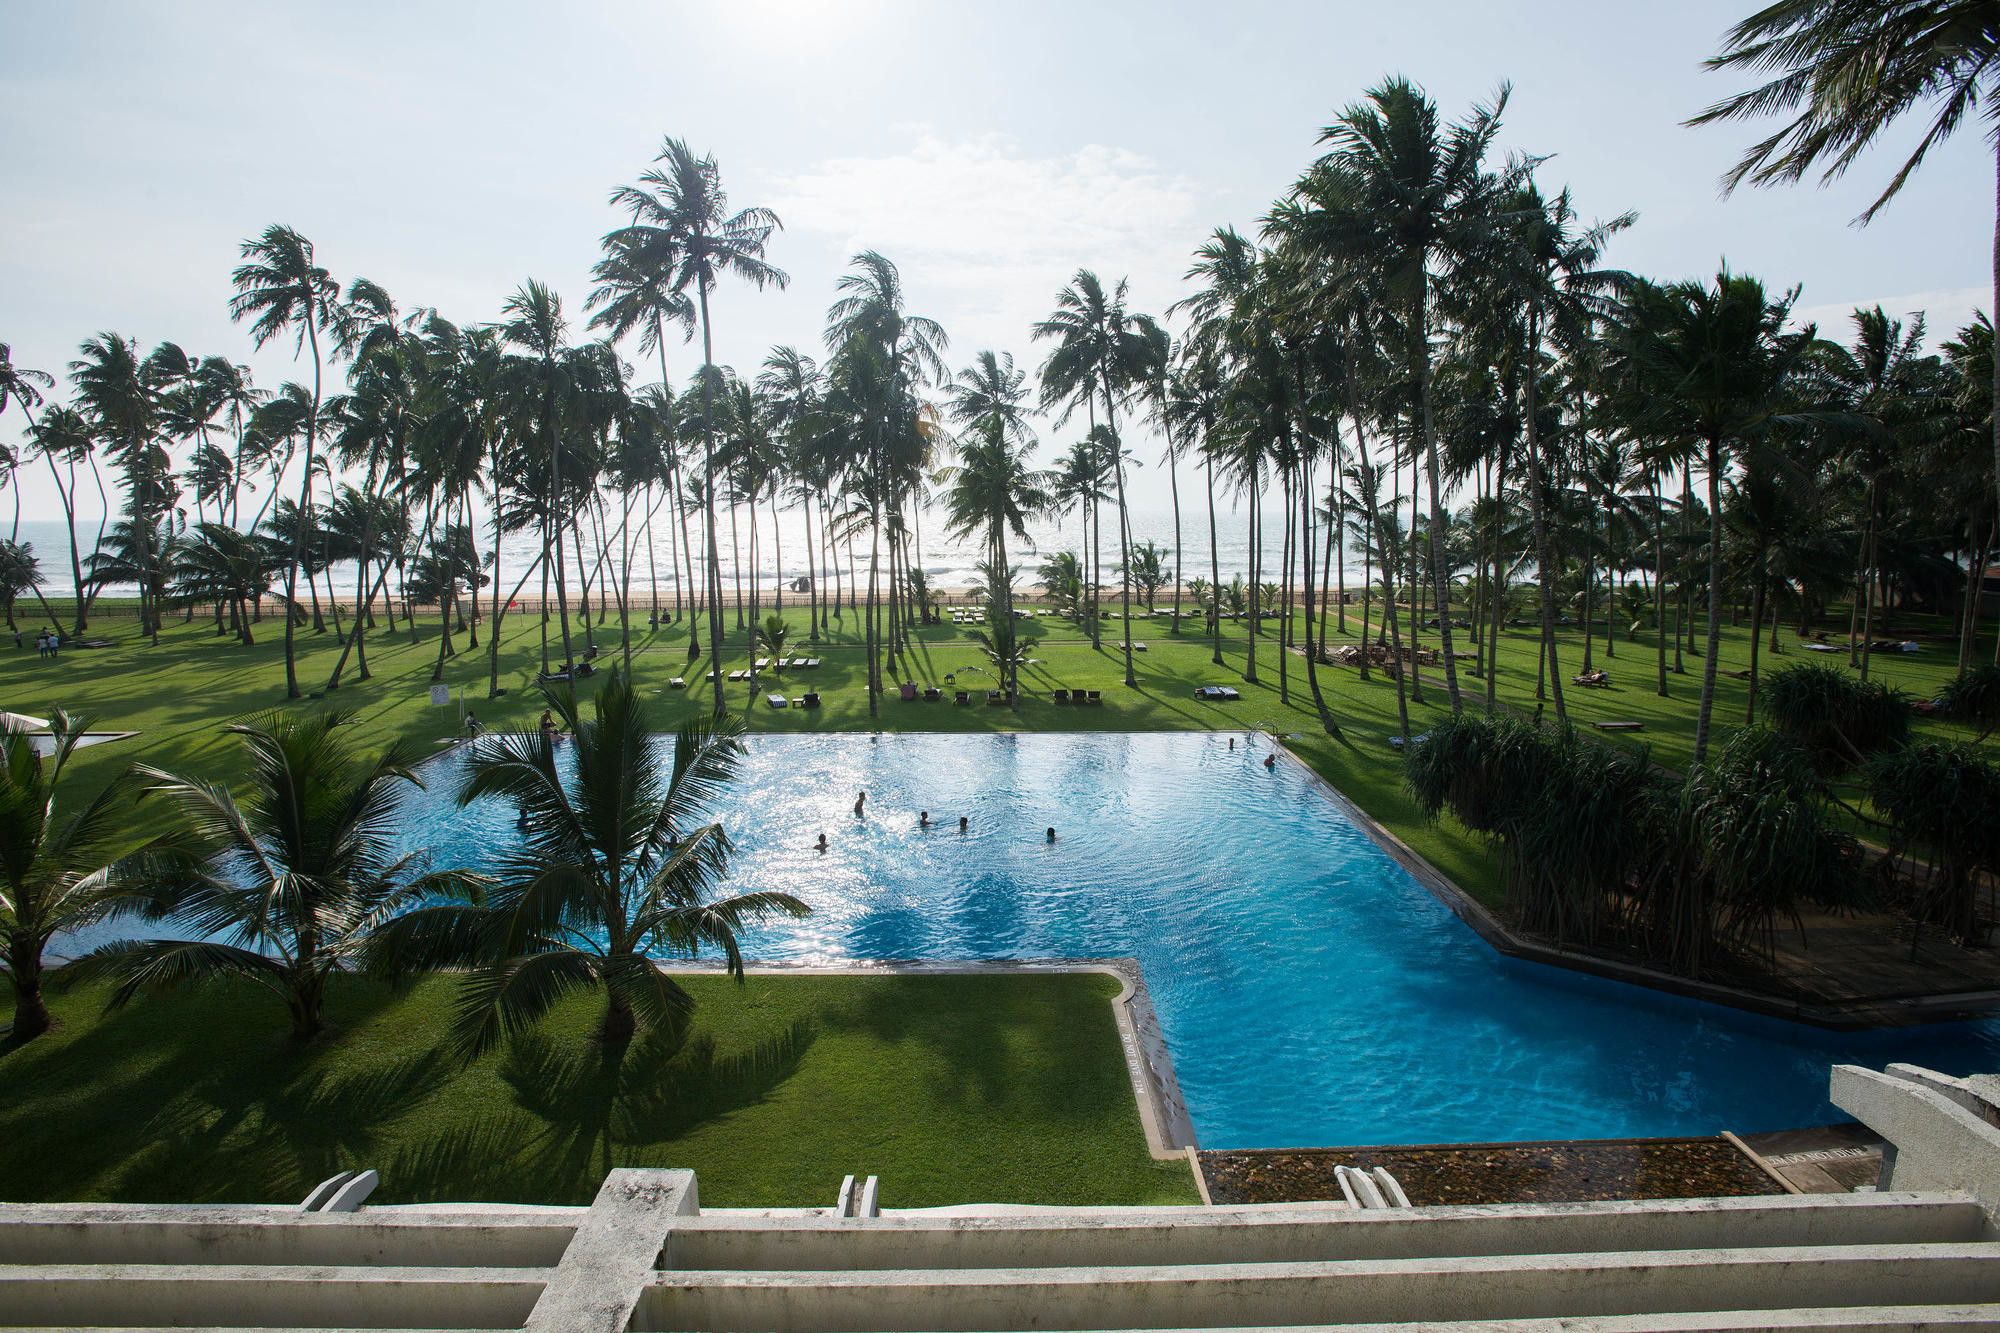 The Blue Water in Sri Lanka